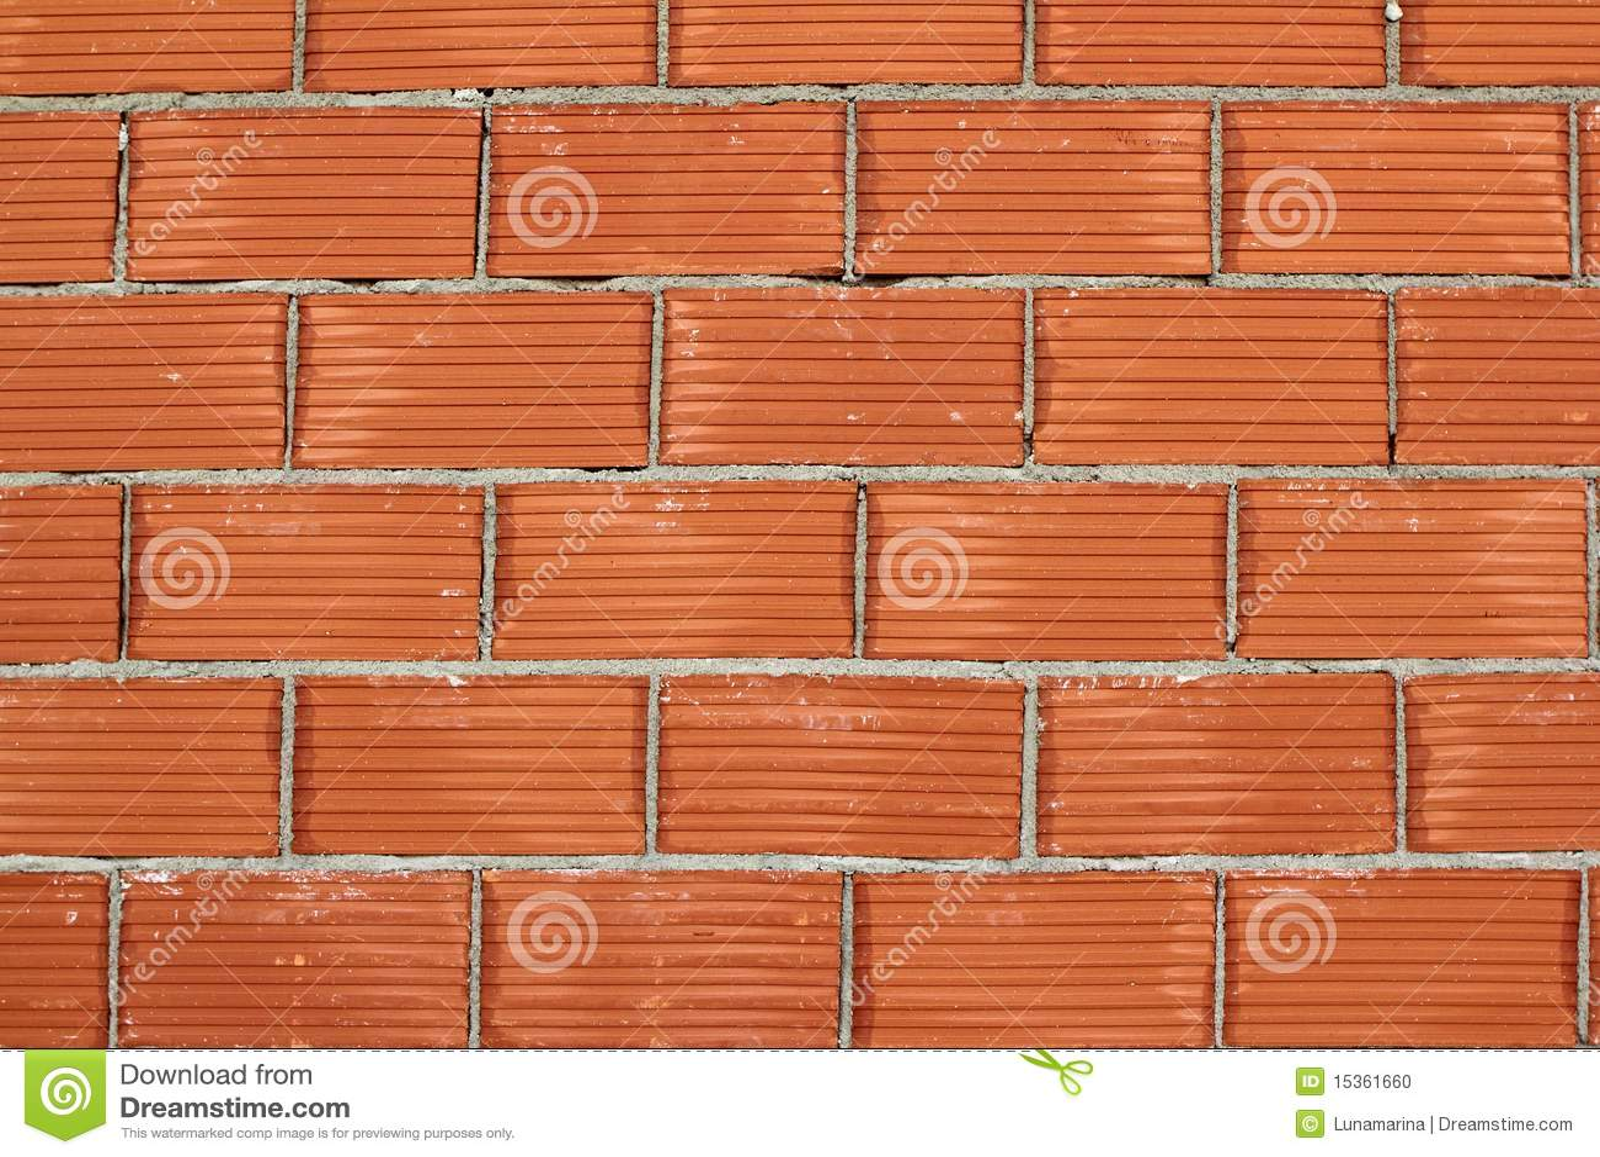 Red Clay Bricks : Red clay brick wall construction airbrick stock photo